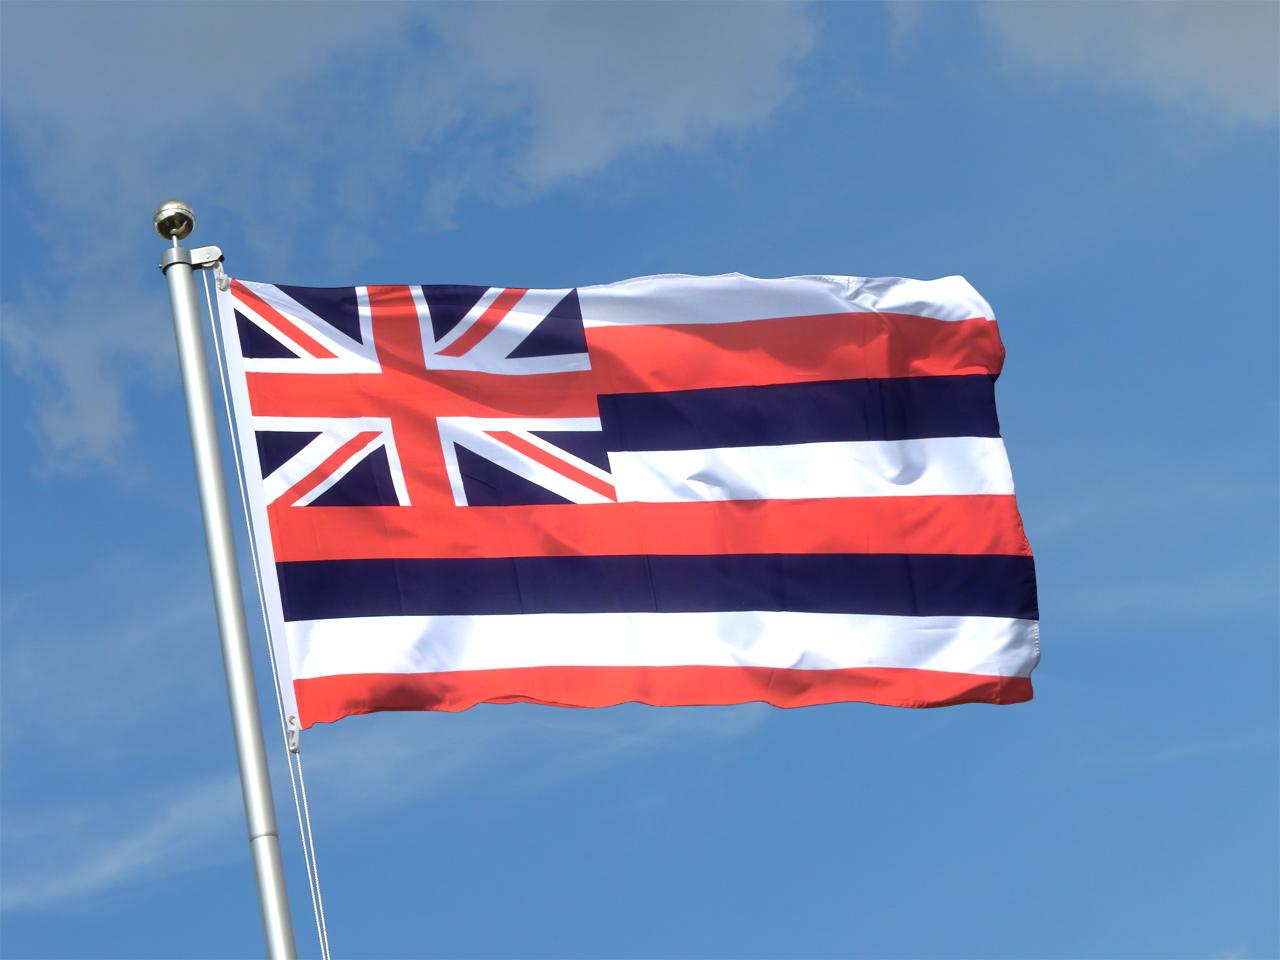 hawaii flagge 90 x 150 cm kaufen. Black Bedroom Furniture Sets. Home Design Ideas